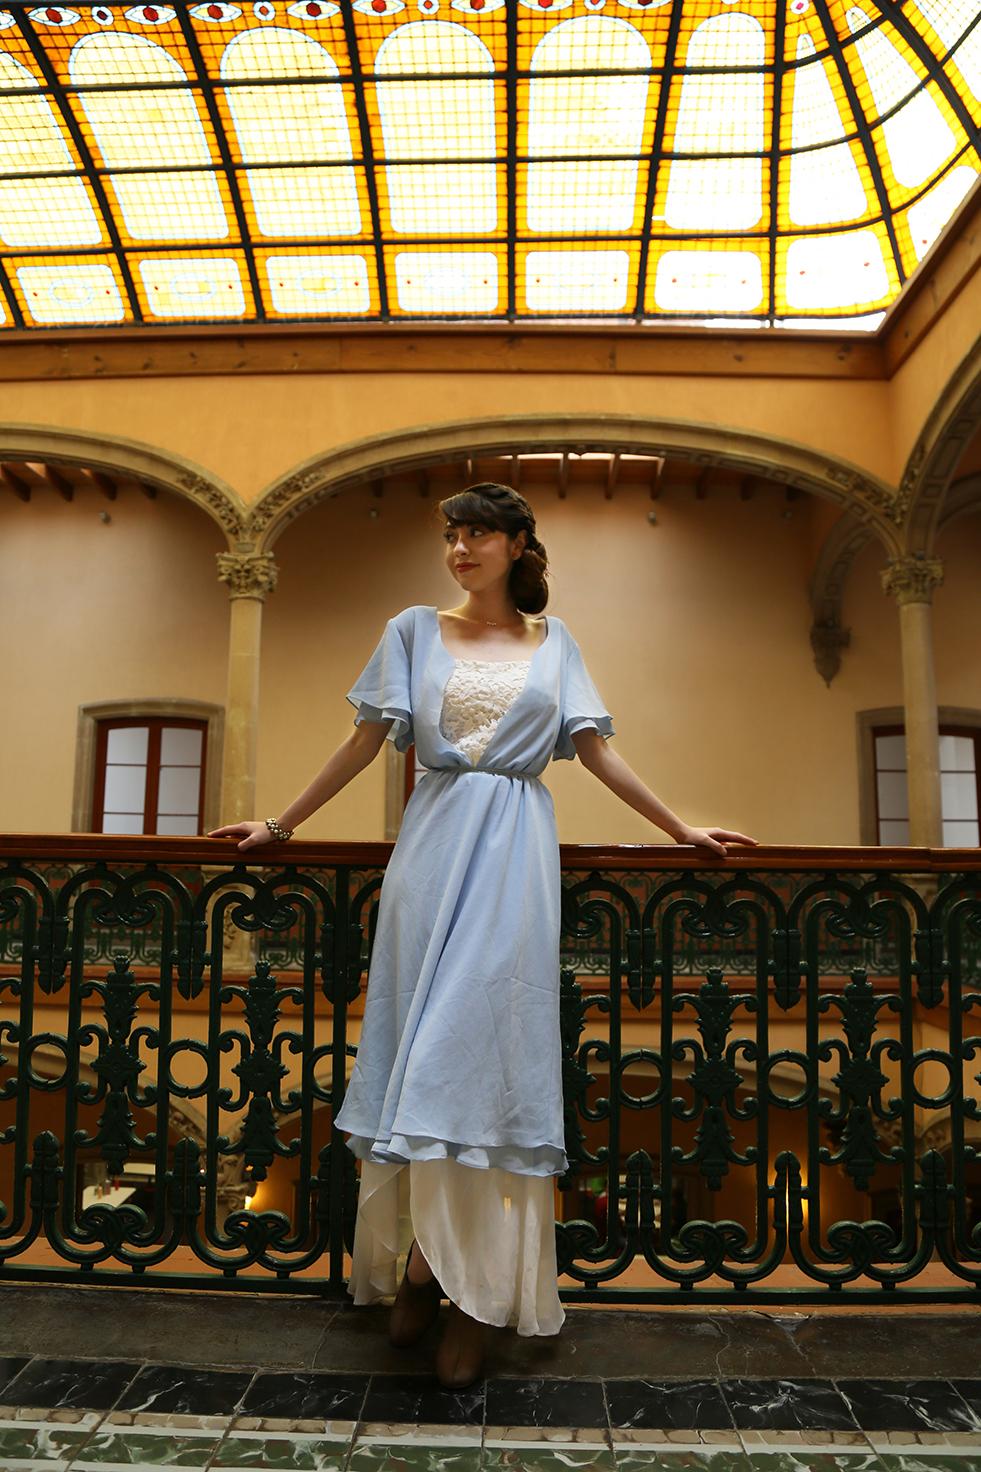 Maroge-Angela-Velazquez-fotografia-sesiones-diseño-7